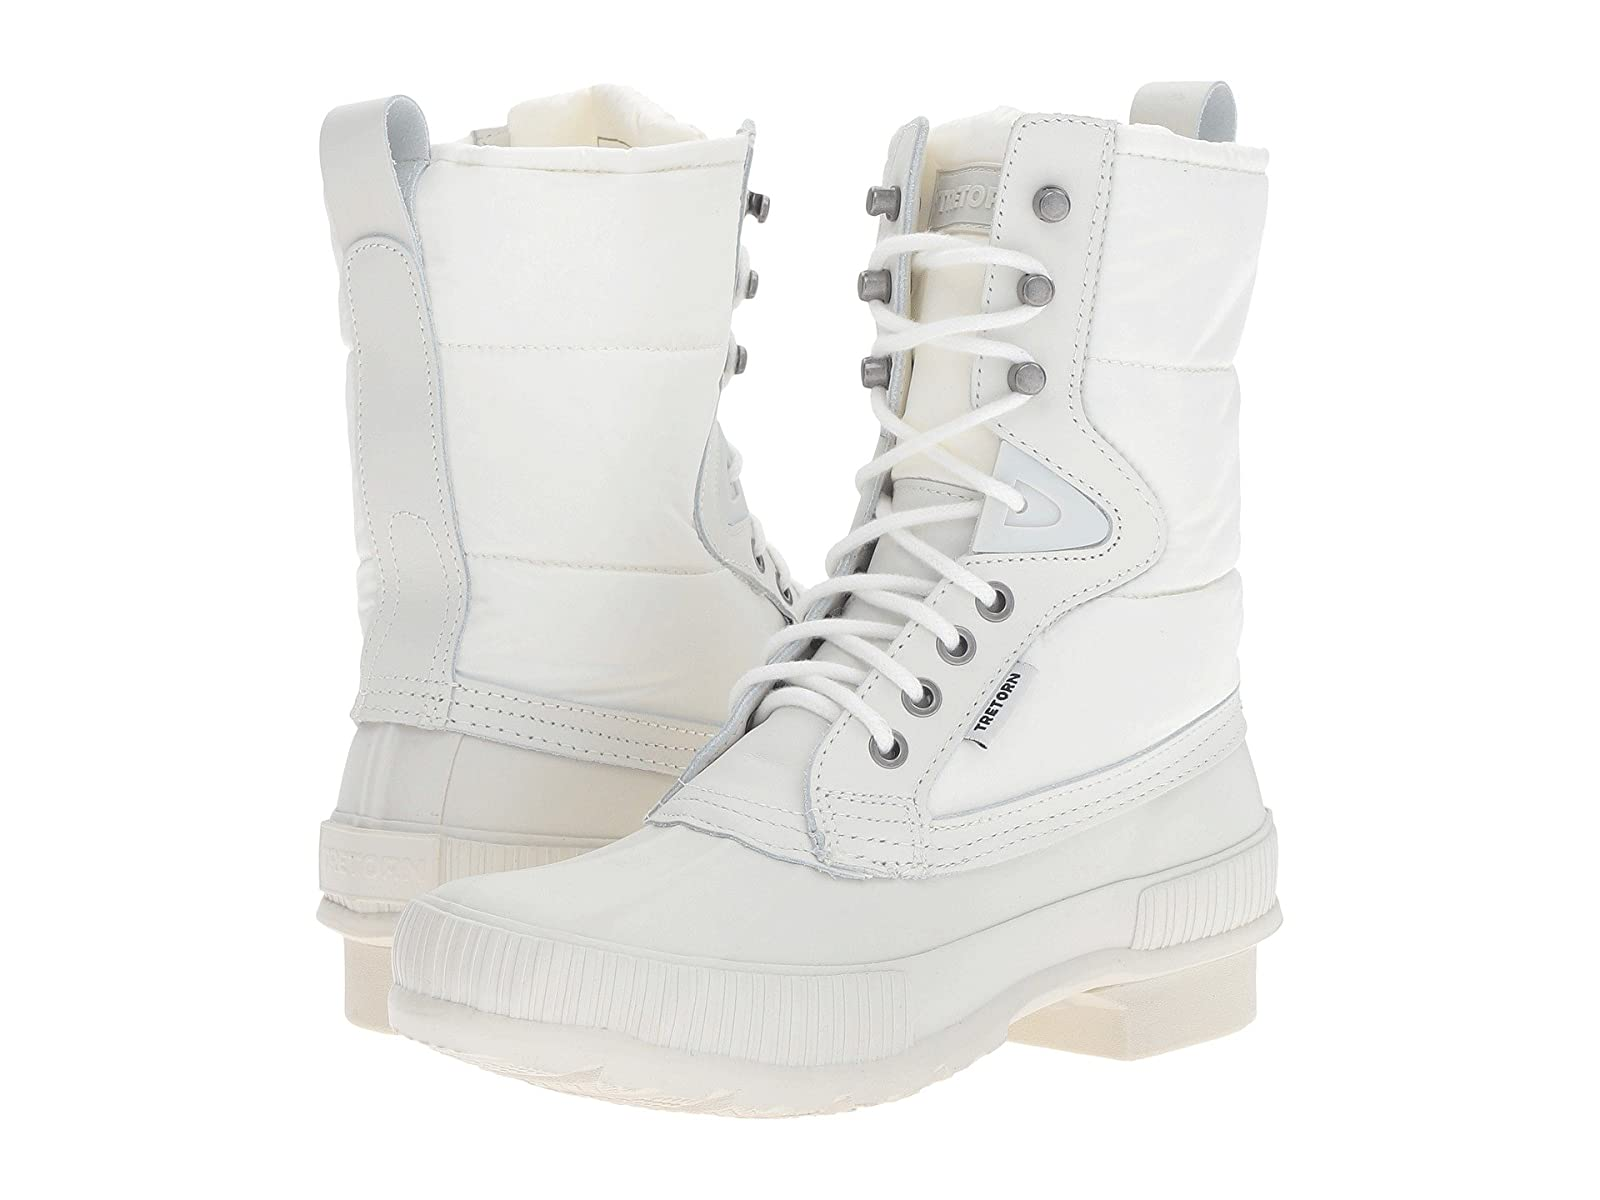 Tretorn FoleyCheap and distinctive eye-catching shoes